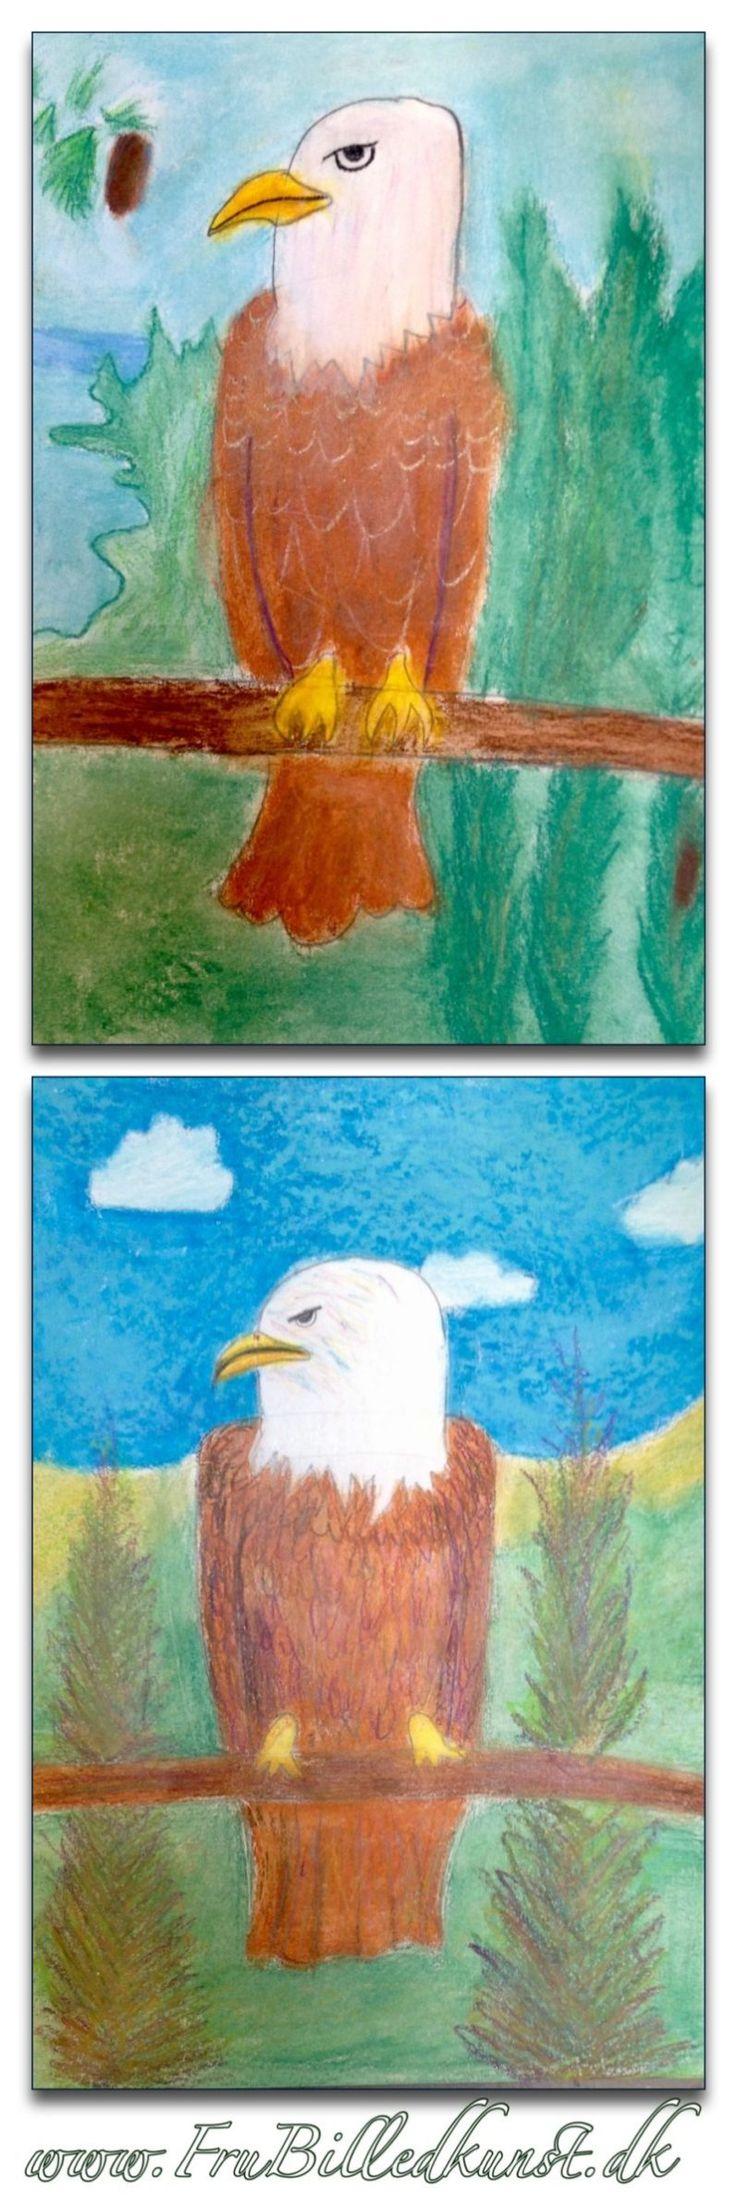 FruBilledkunst | Glimt fra min billedkunstundervisning